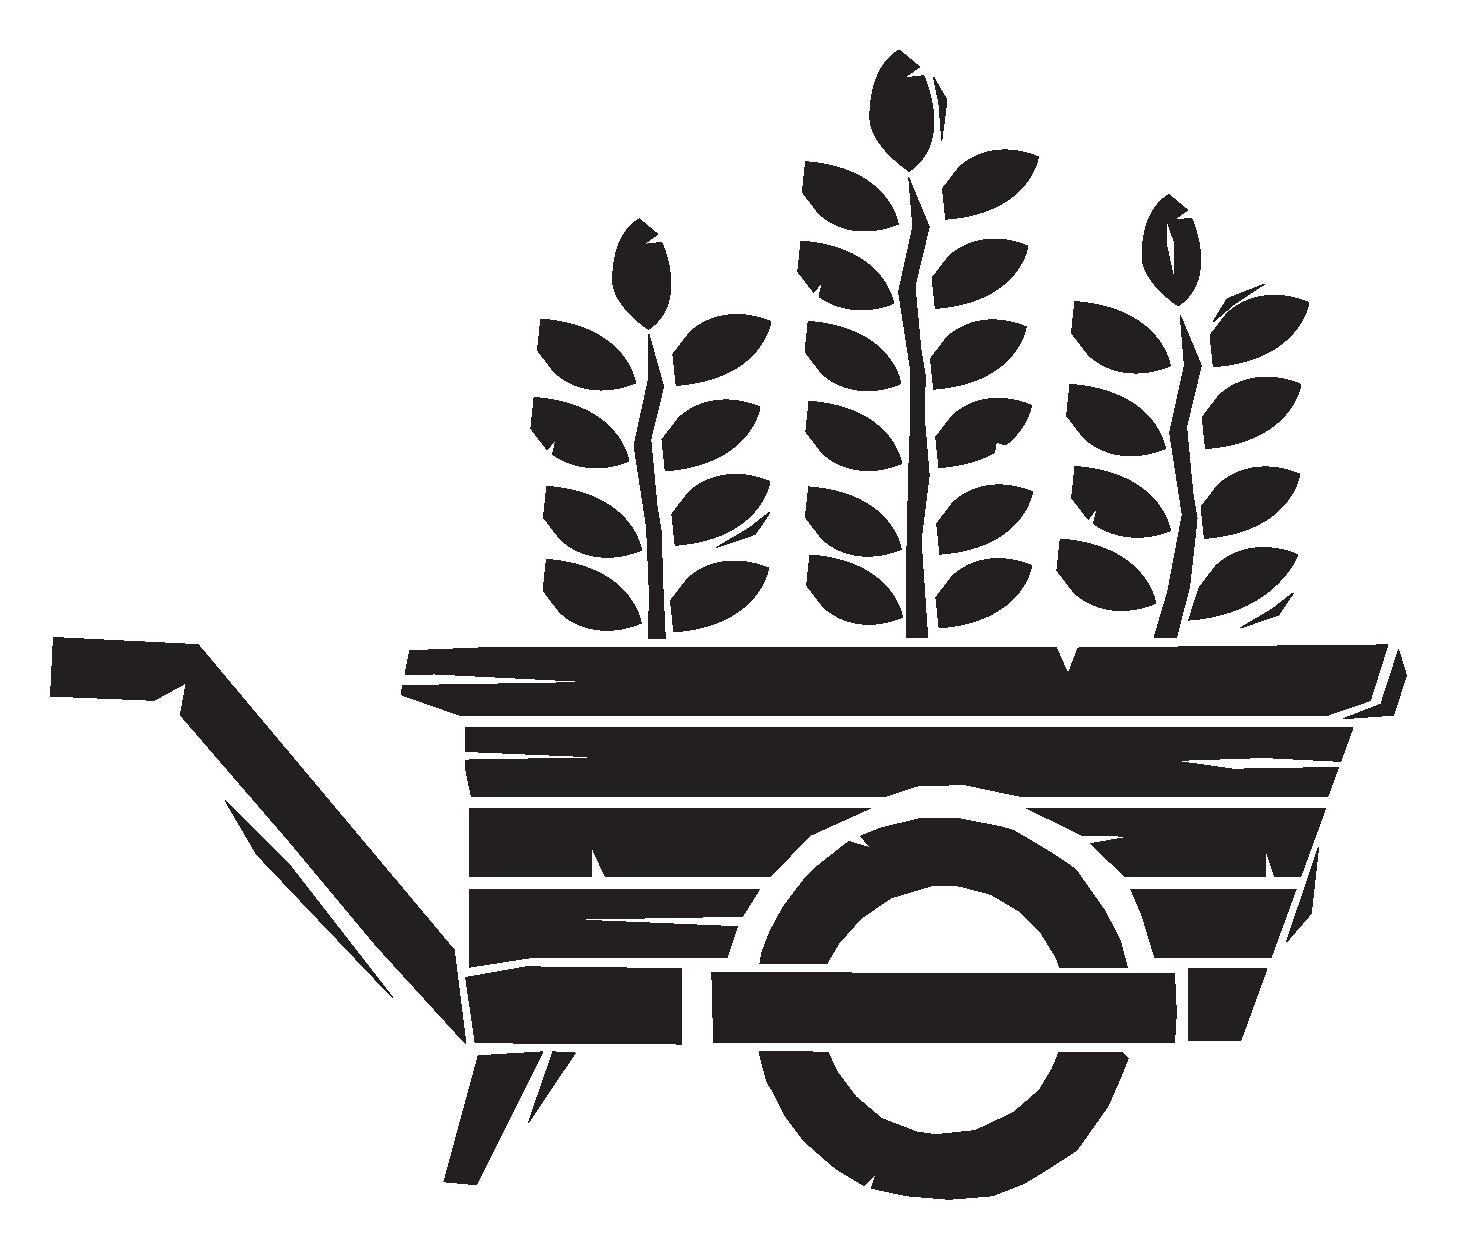 SCF_wheel-barrow-03.png